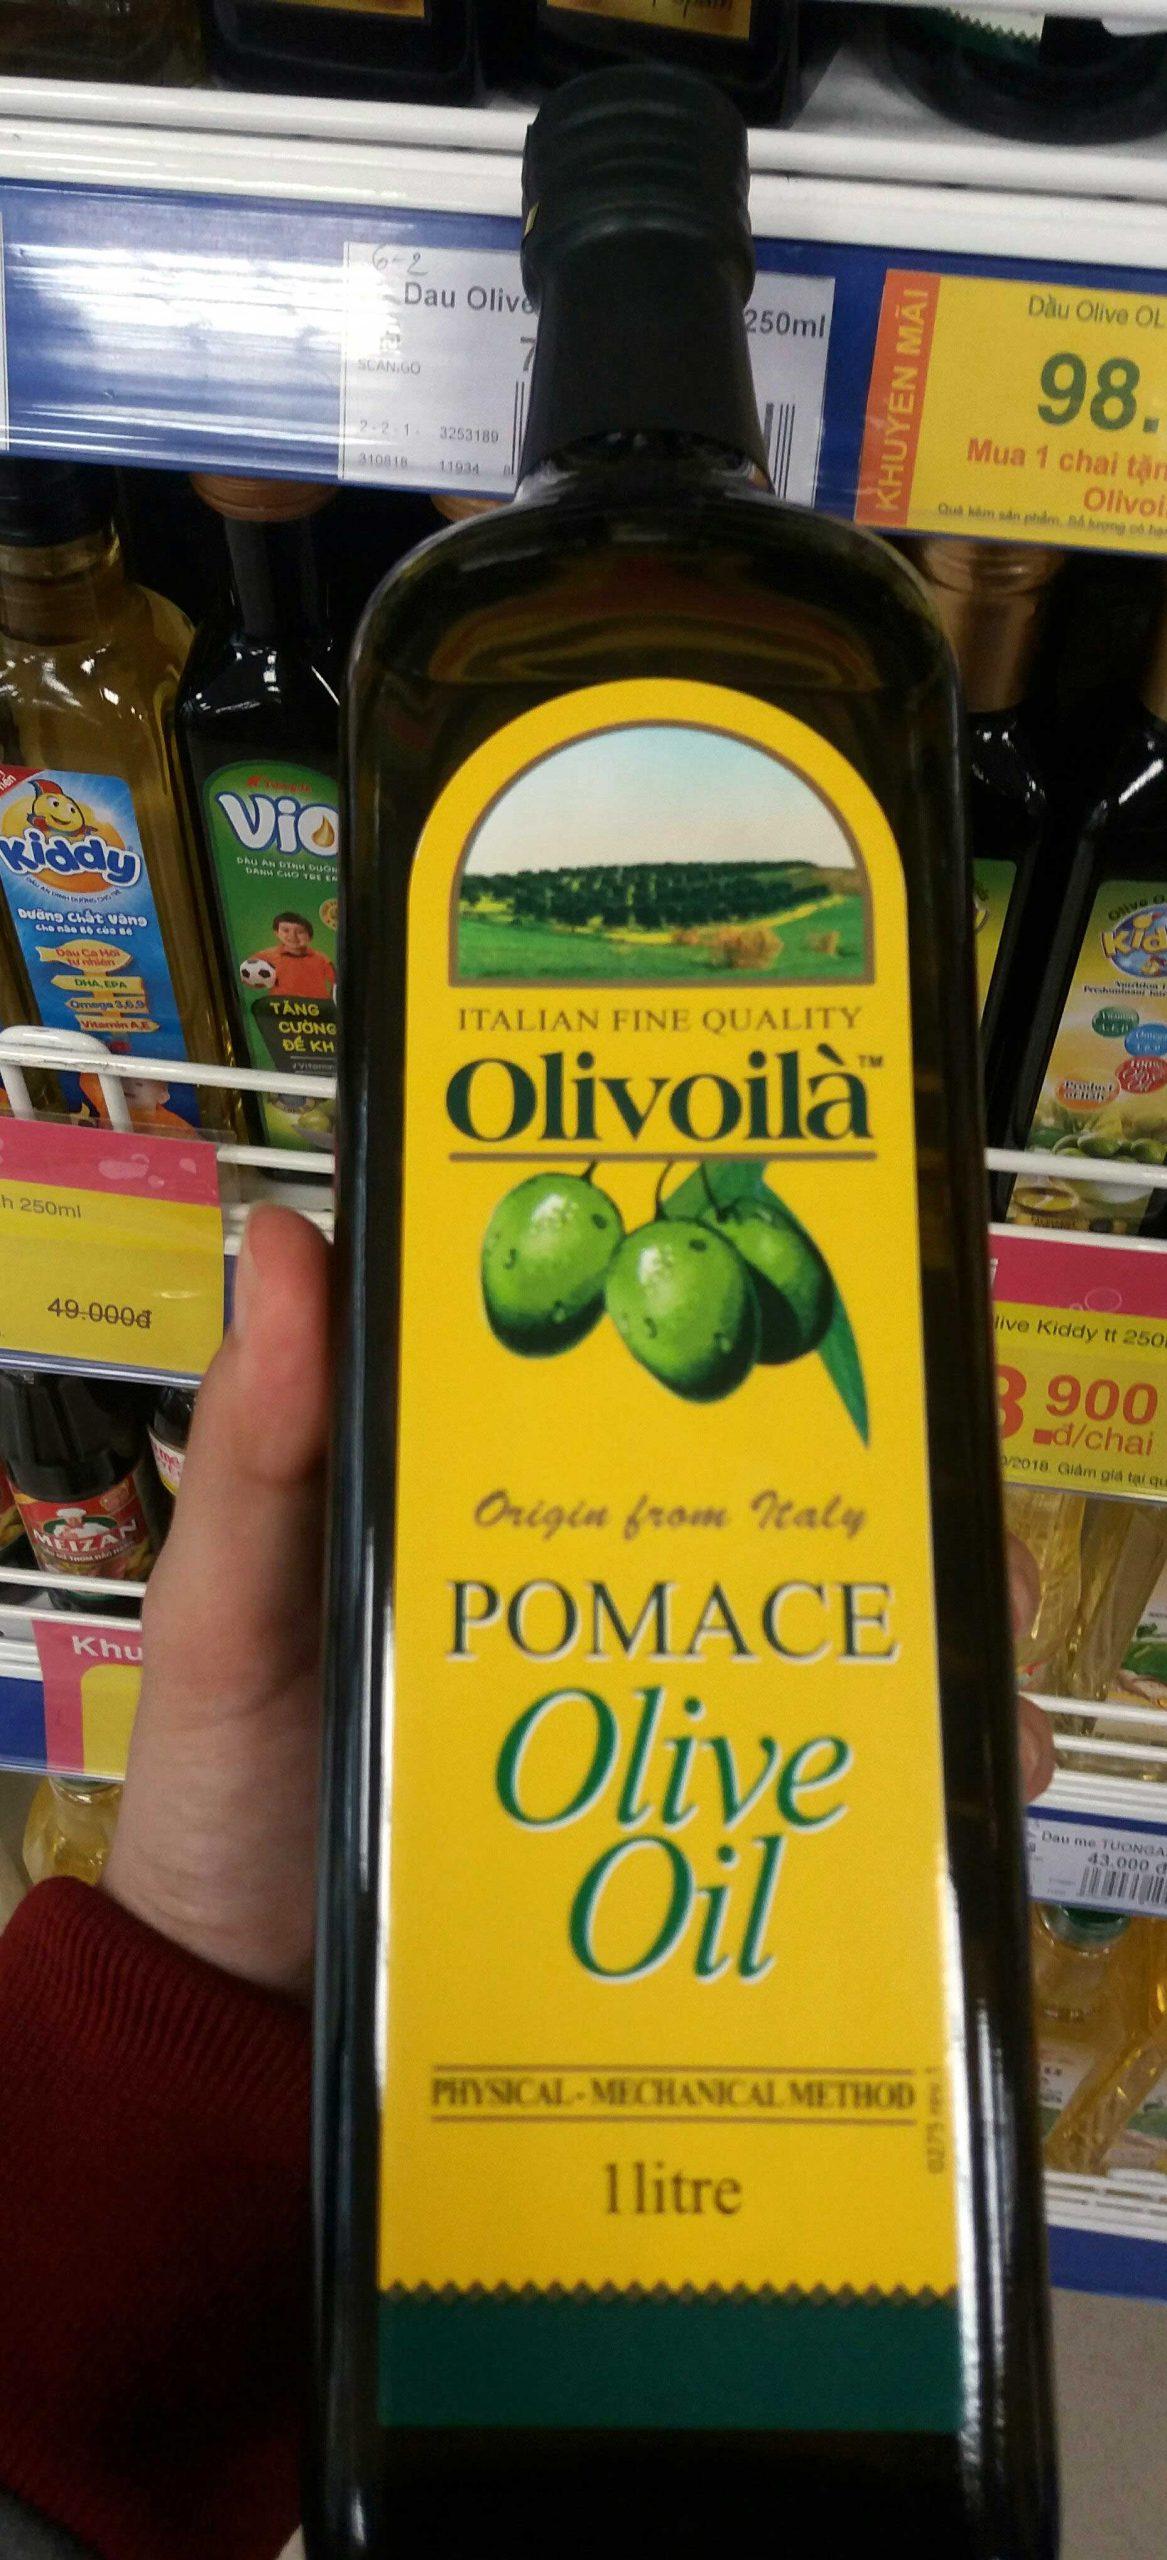 Pomace olive oil.